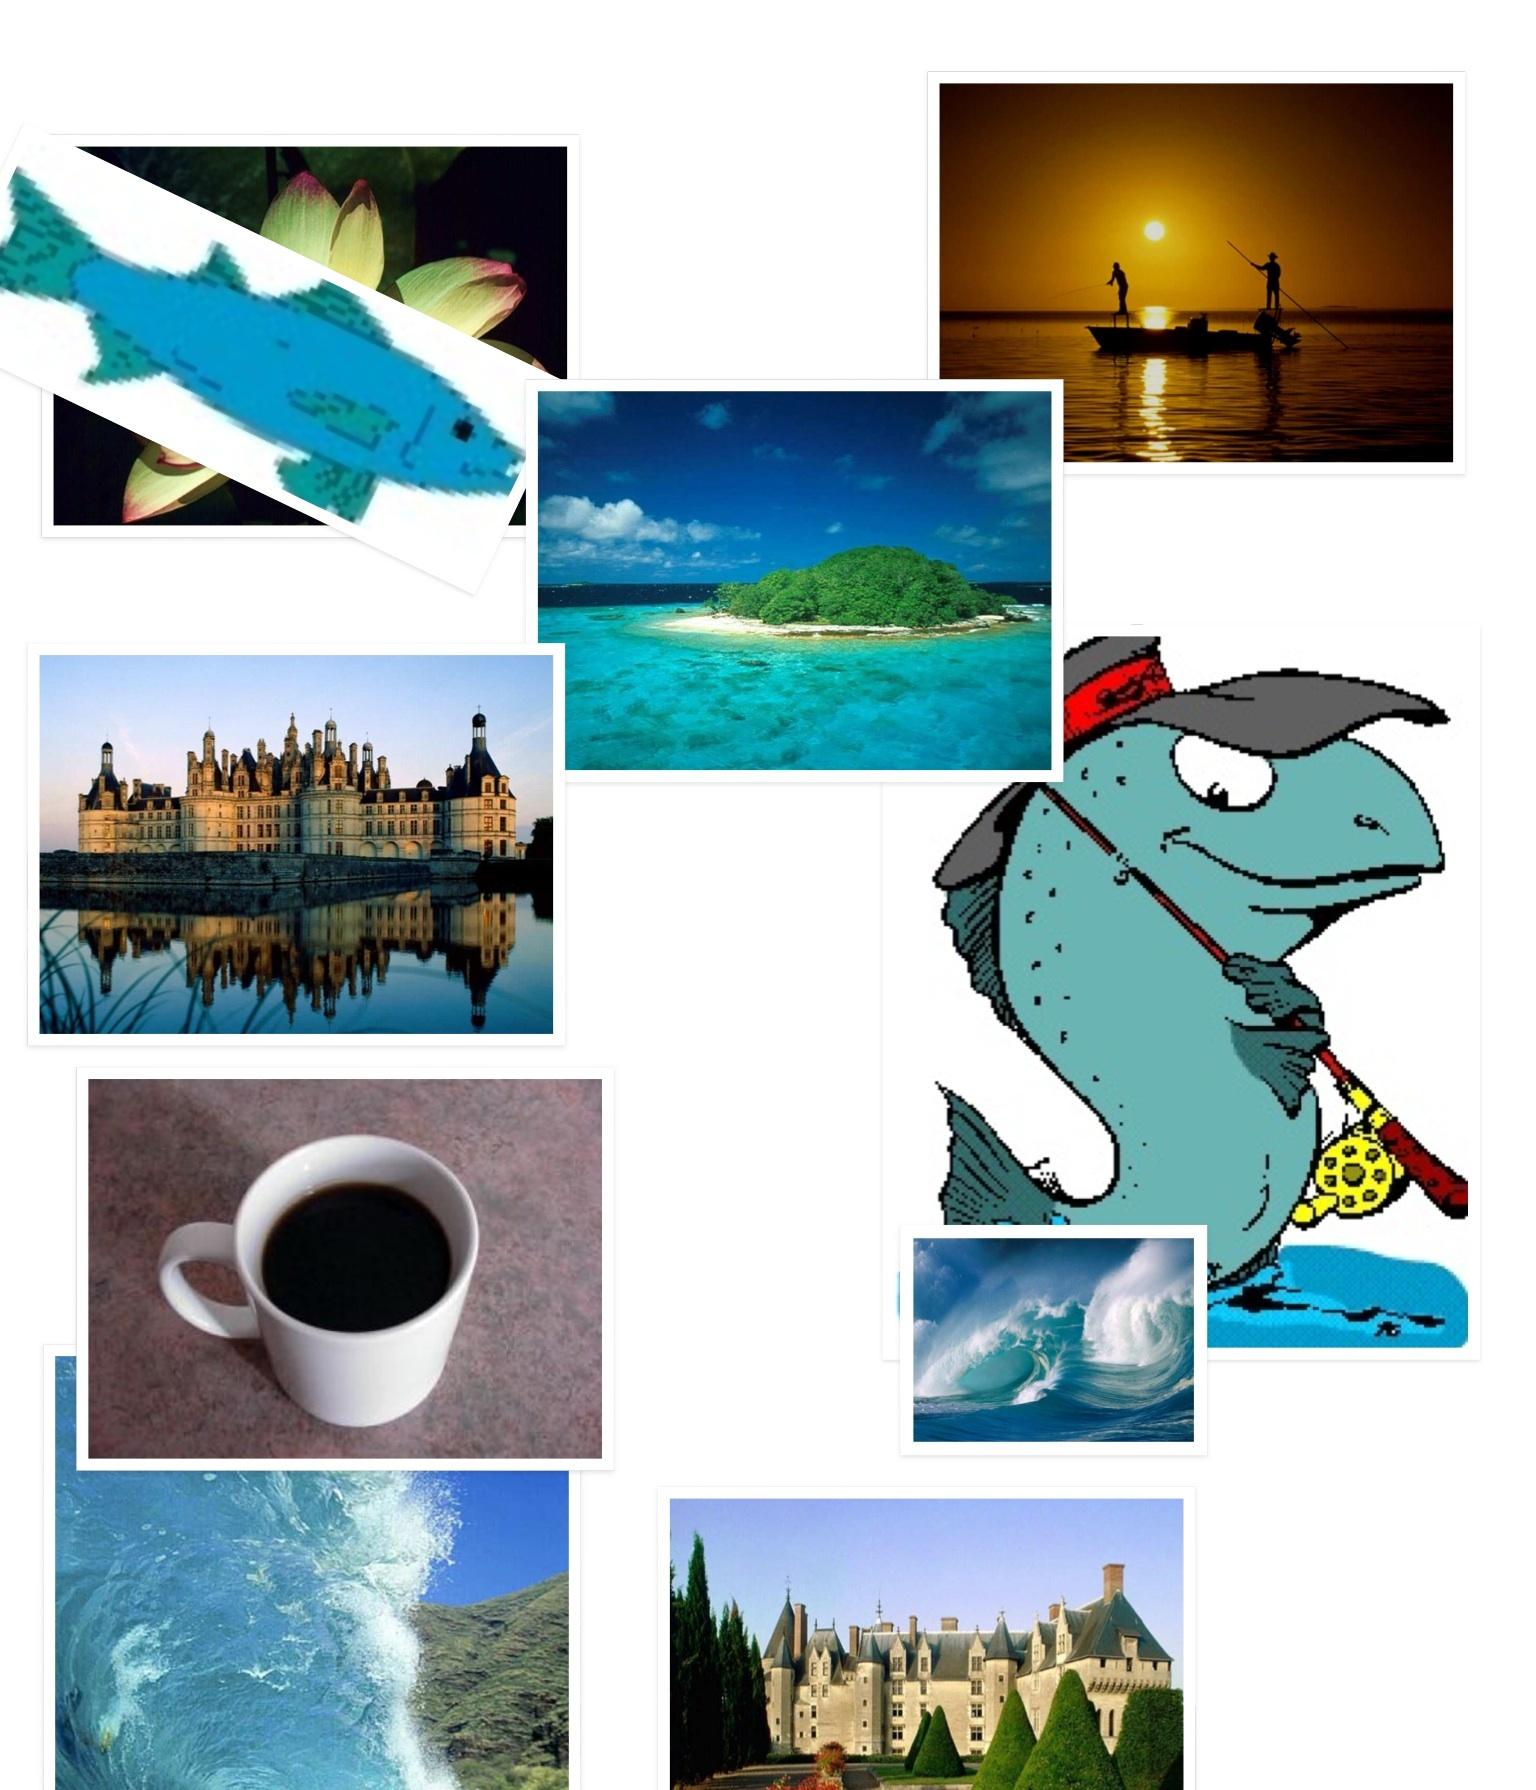 Fotos variadas